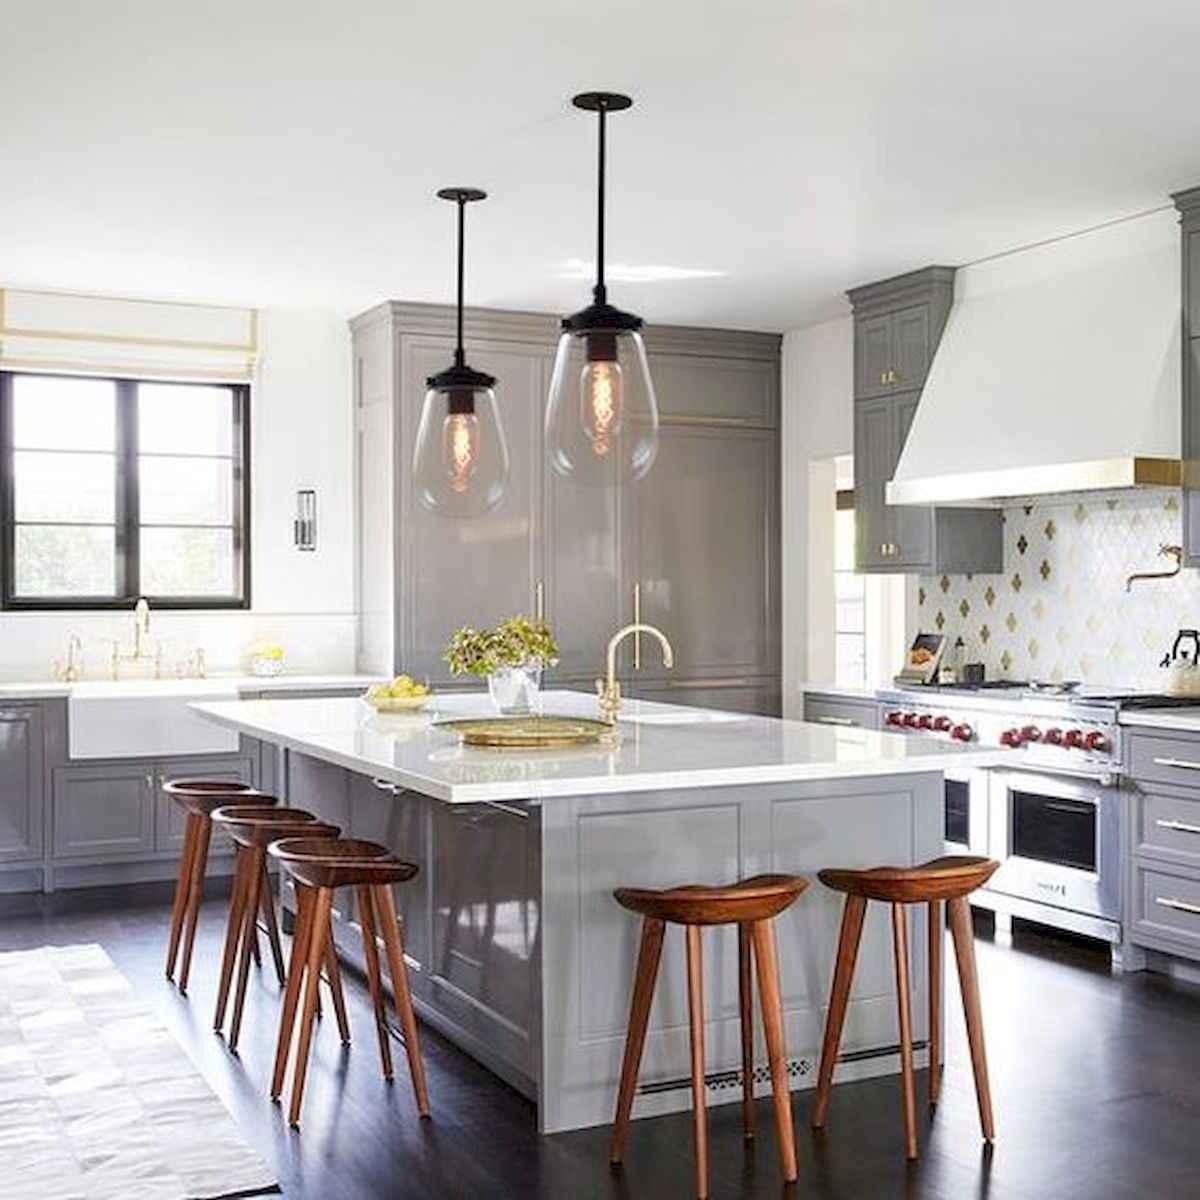 25 Best Fixer Upper Farmhouse kitchen Design Ideas (25)